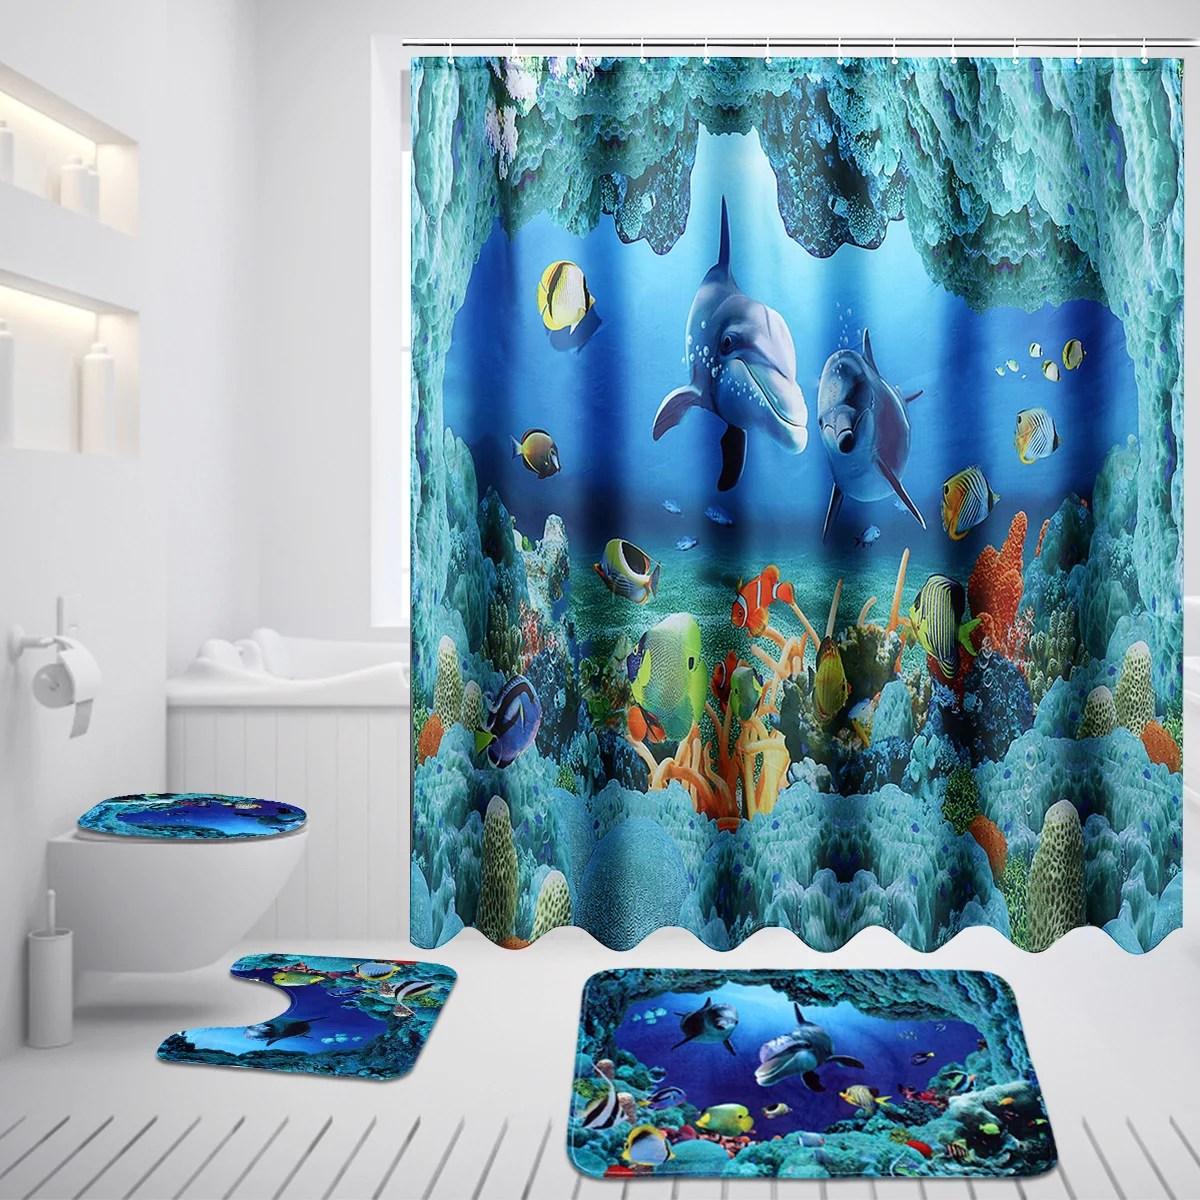 1 3 4pcs 3d deep sea dolphin pattern waterproof bathroom set shower curtain bath mat non slip rug lid toilet cover for home decor gift